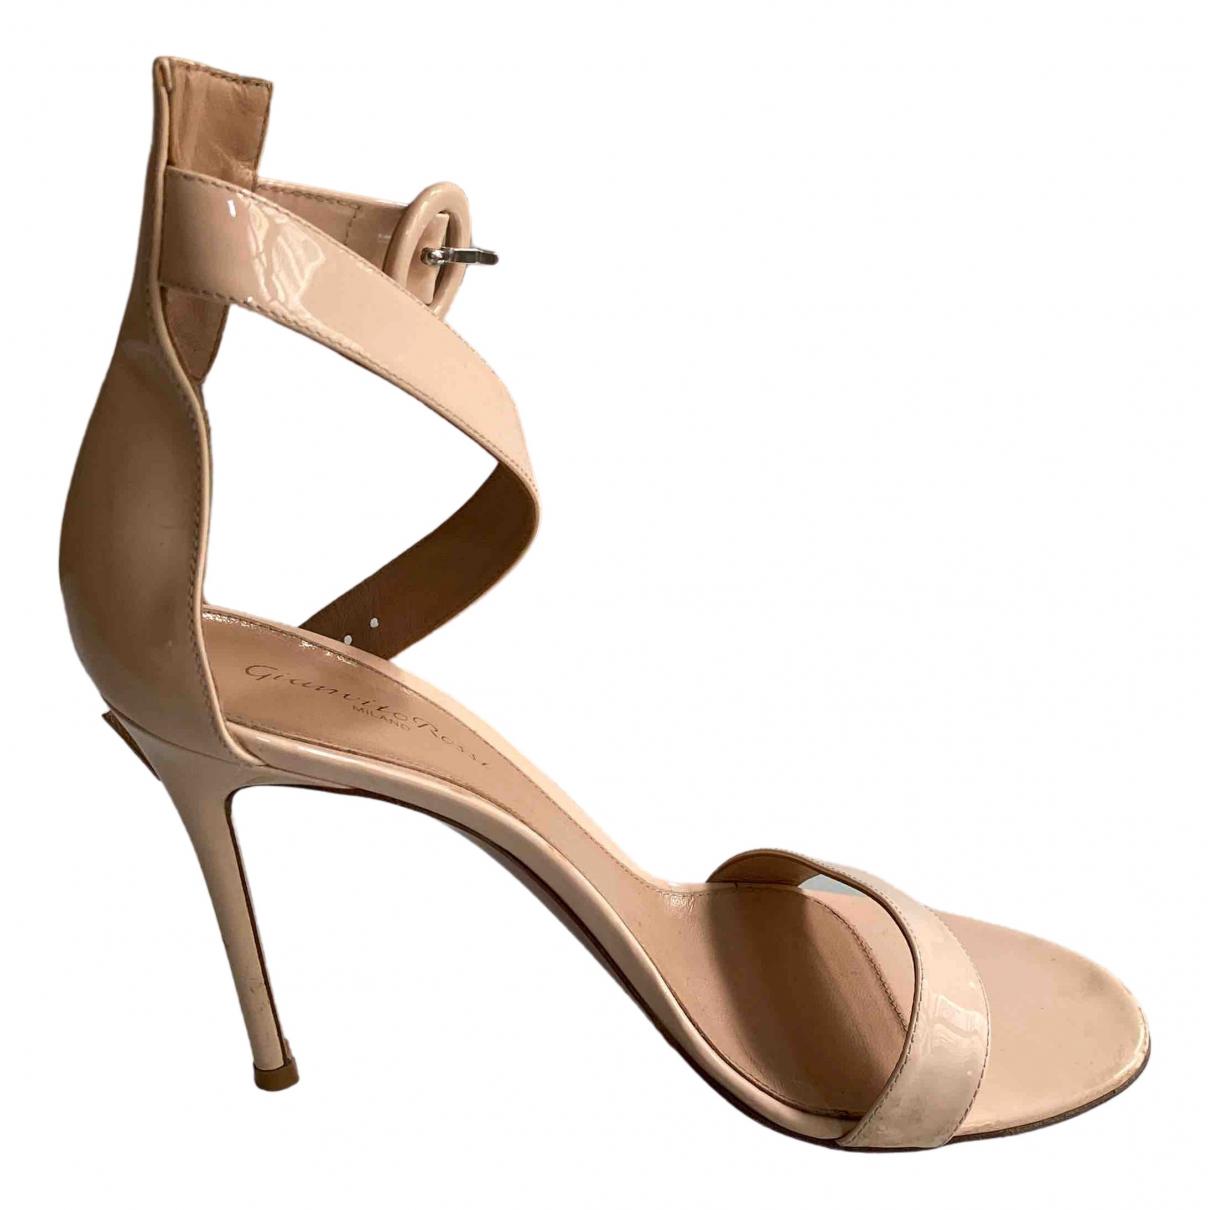 Gianvito Rossi - Sandales   pour femme en cuir - rose